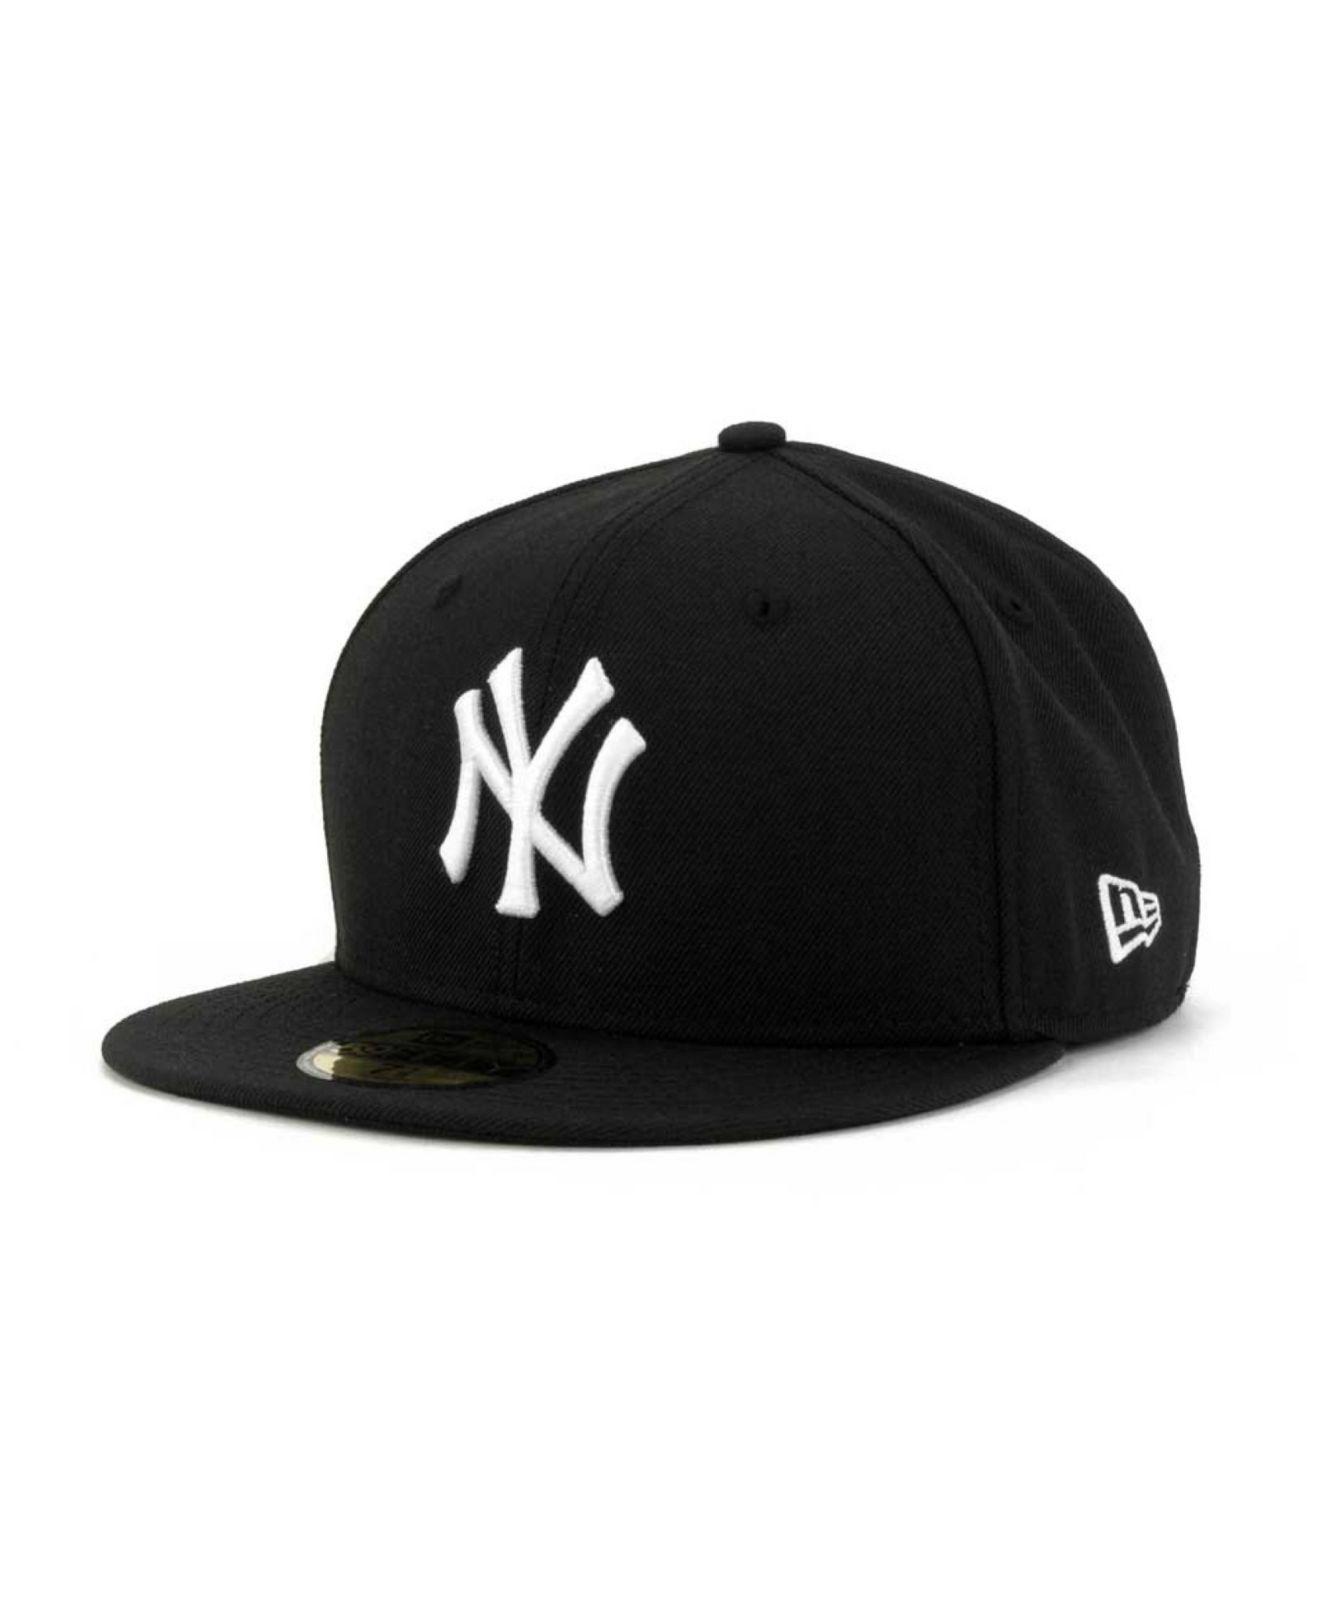 watch bd4d2 5c9cb ... australia ktz black new york yankees b dub 59fifty cap for men lyst.  view fullscreen